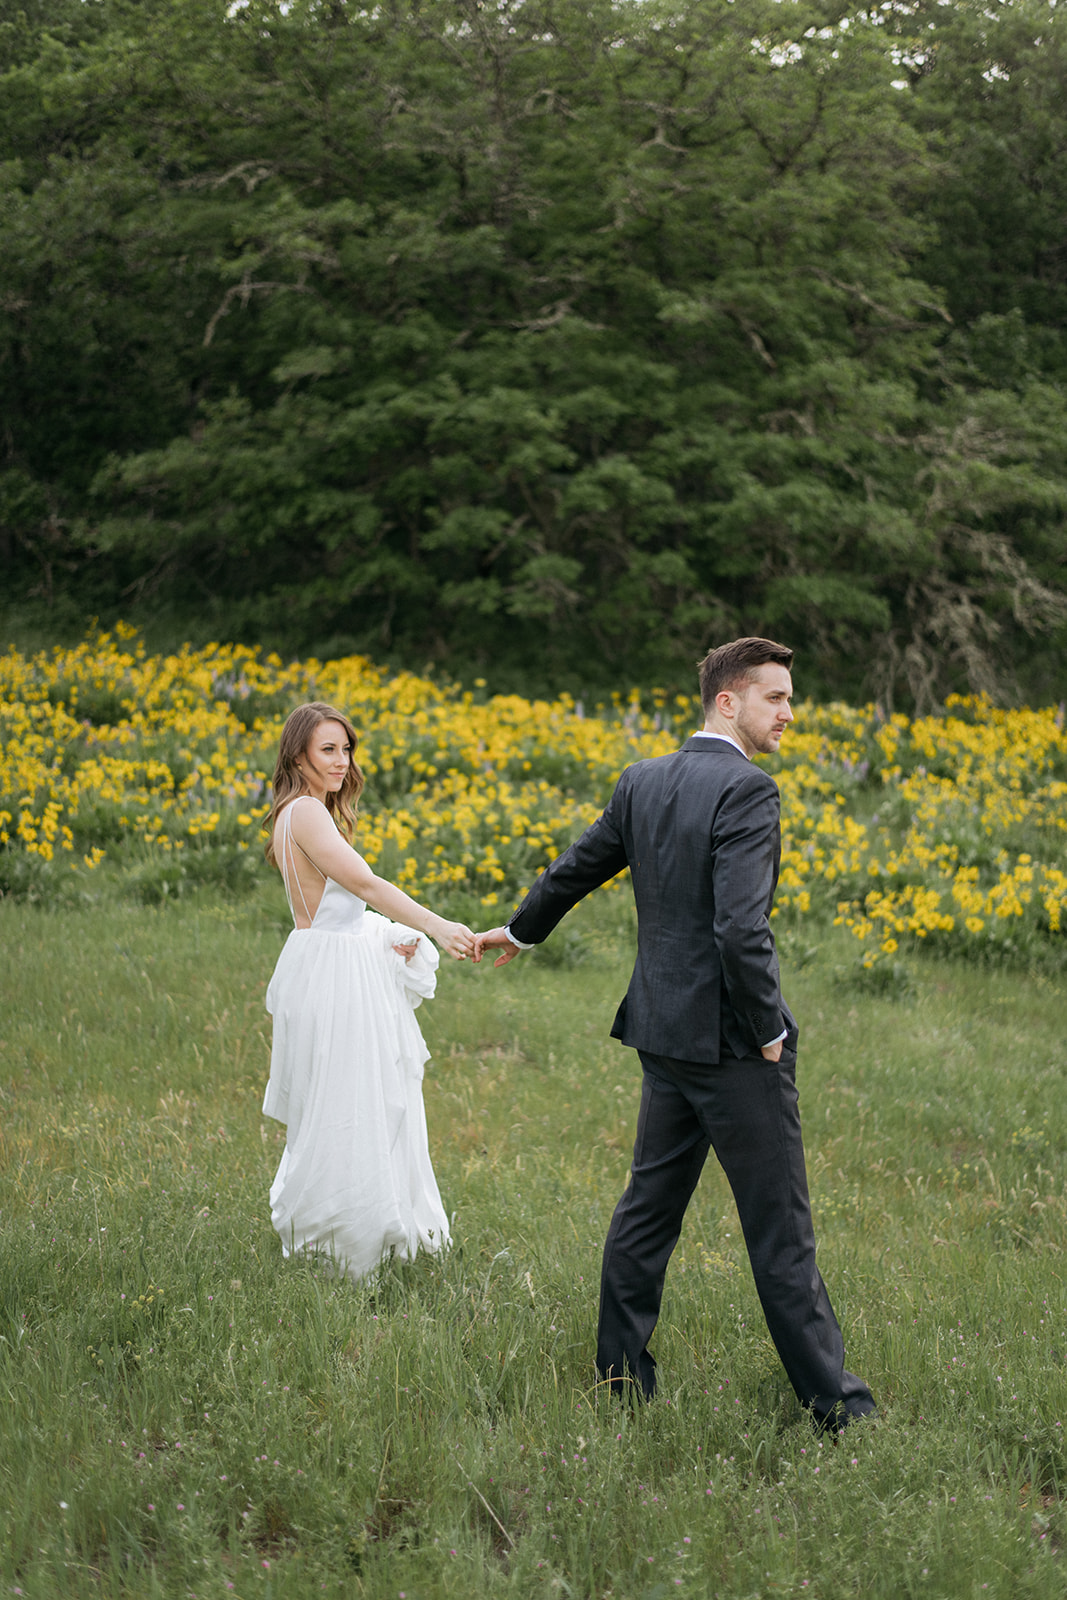 kamea_events_wedding_planner_portland_DeusAmor57.jpg